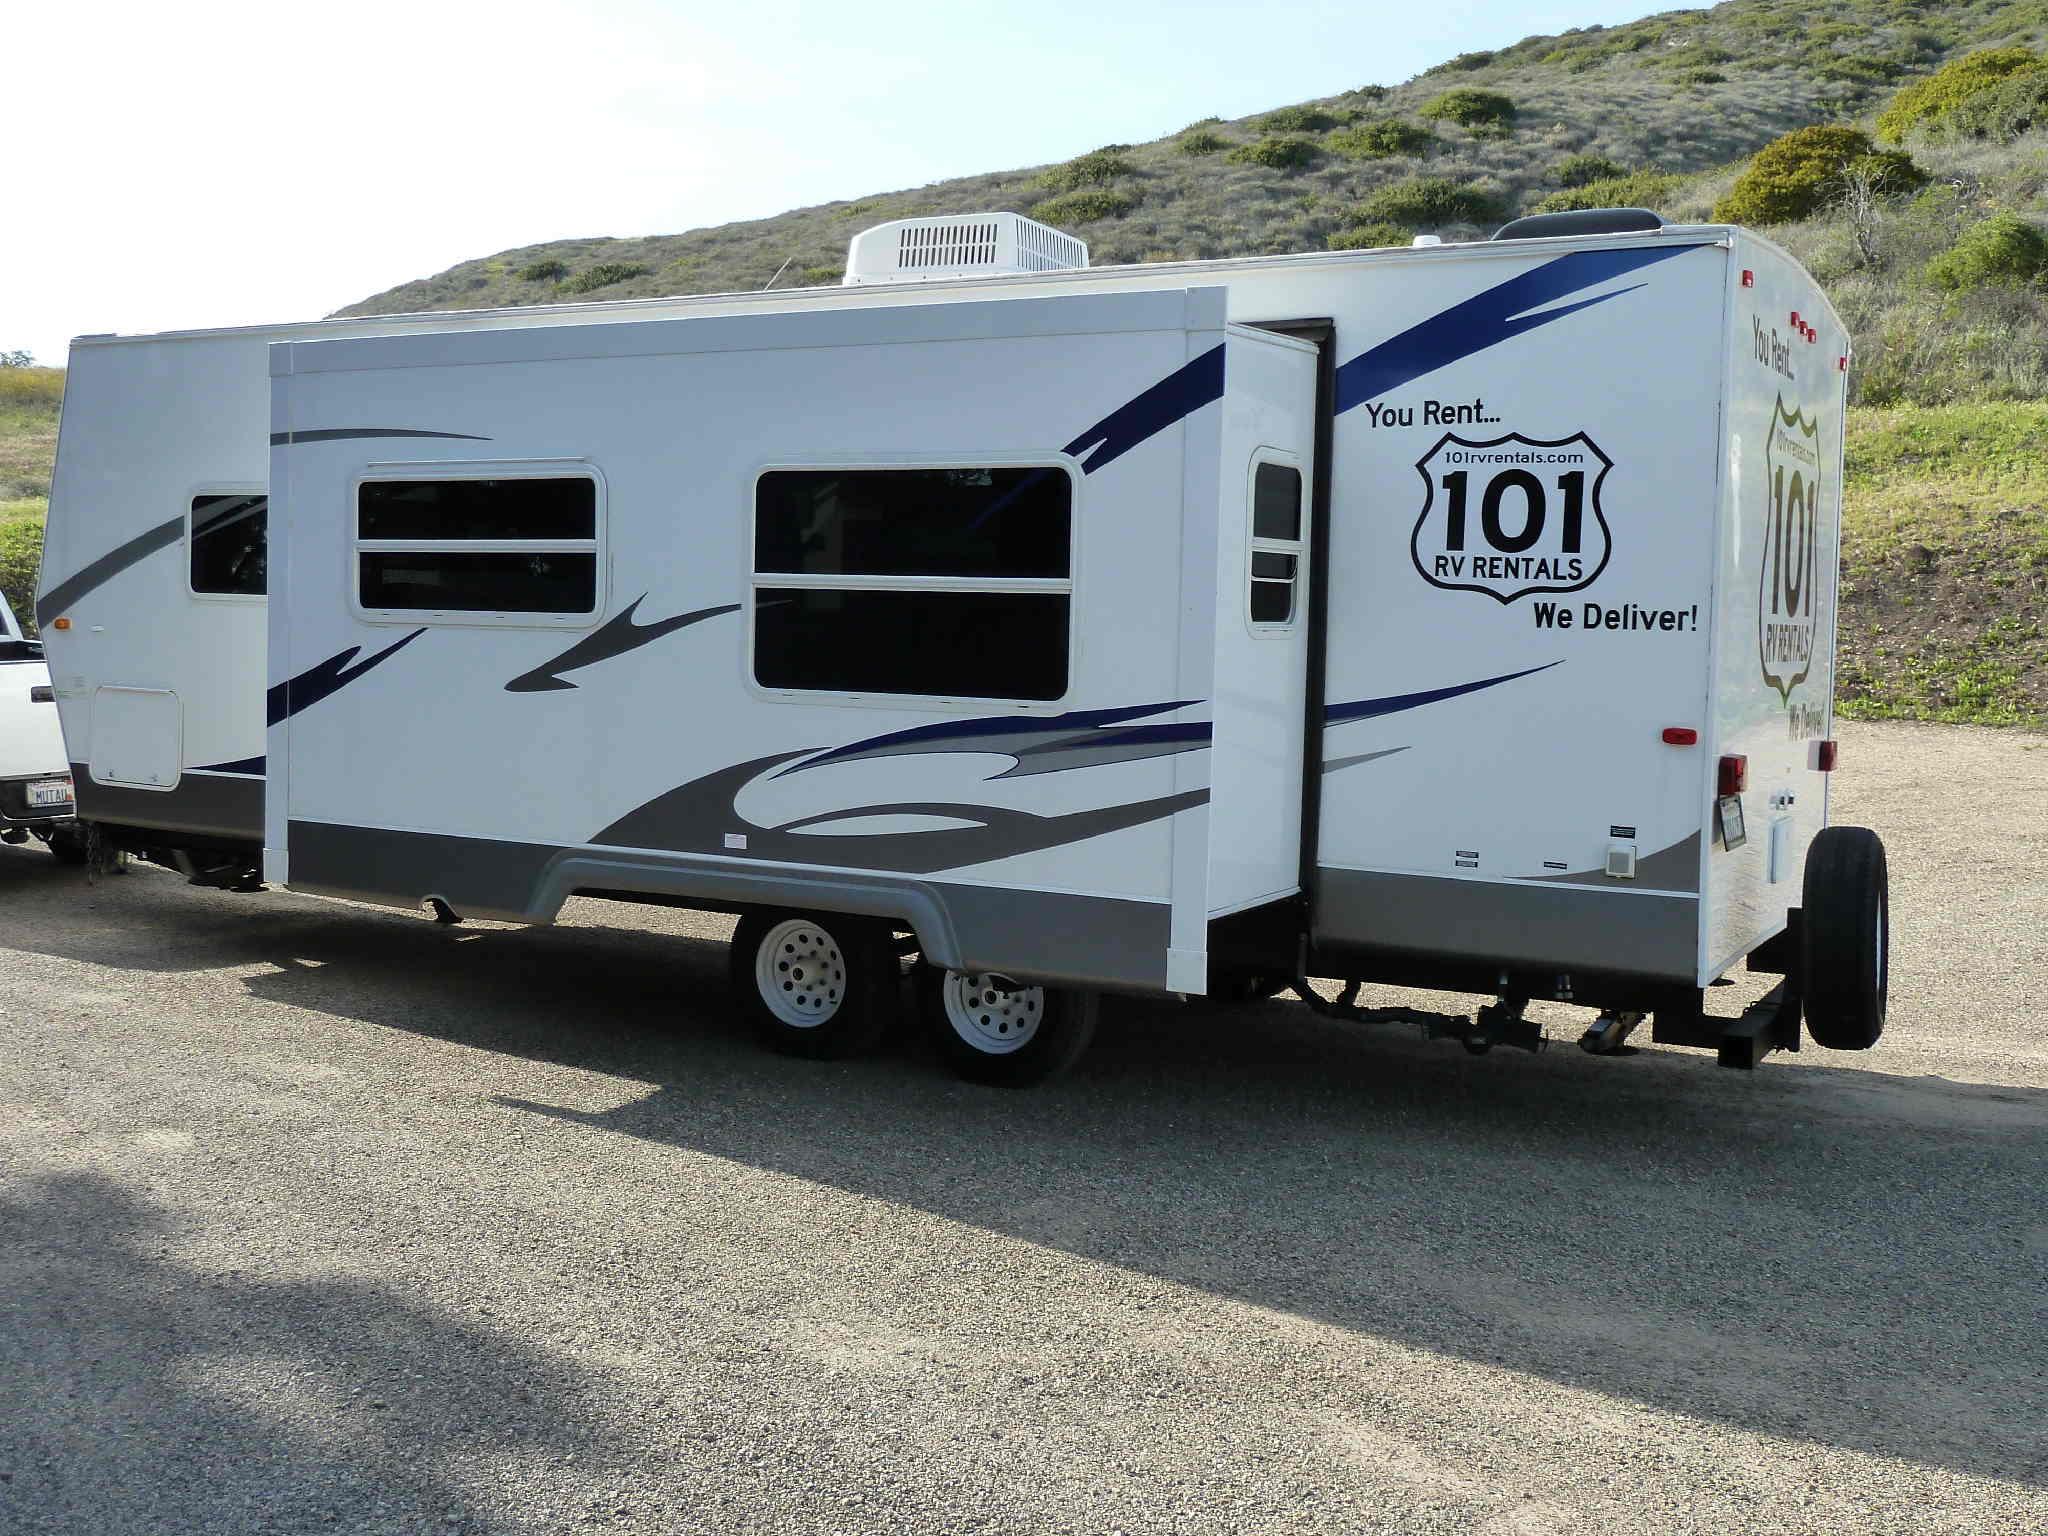 101 Rv Rentals In Simi Valley Ca 93065